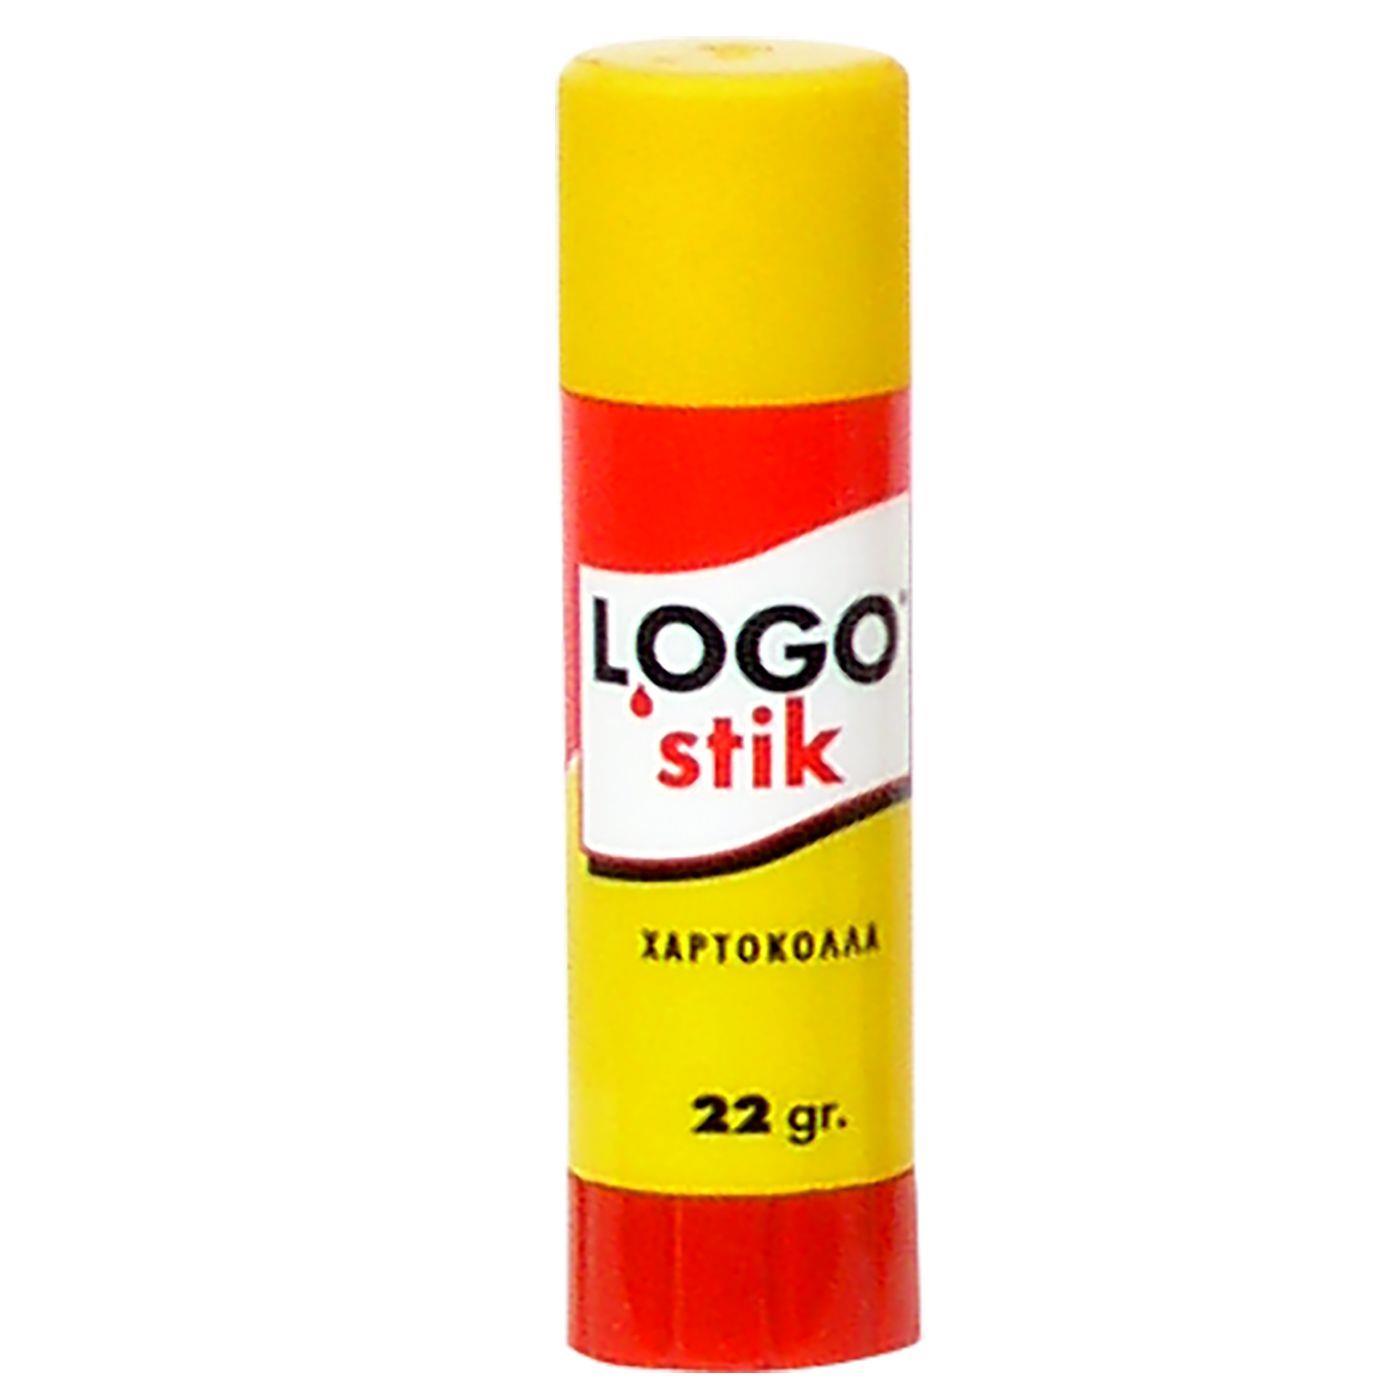 LOGO STICK  22gr